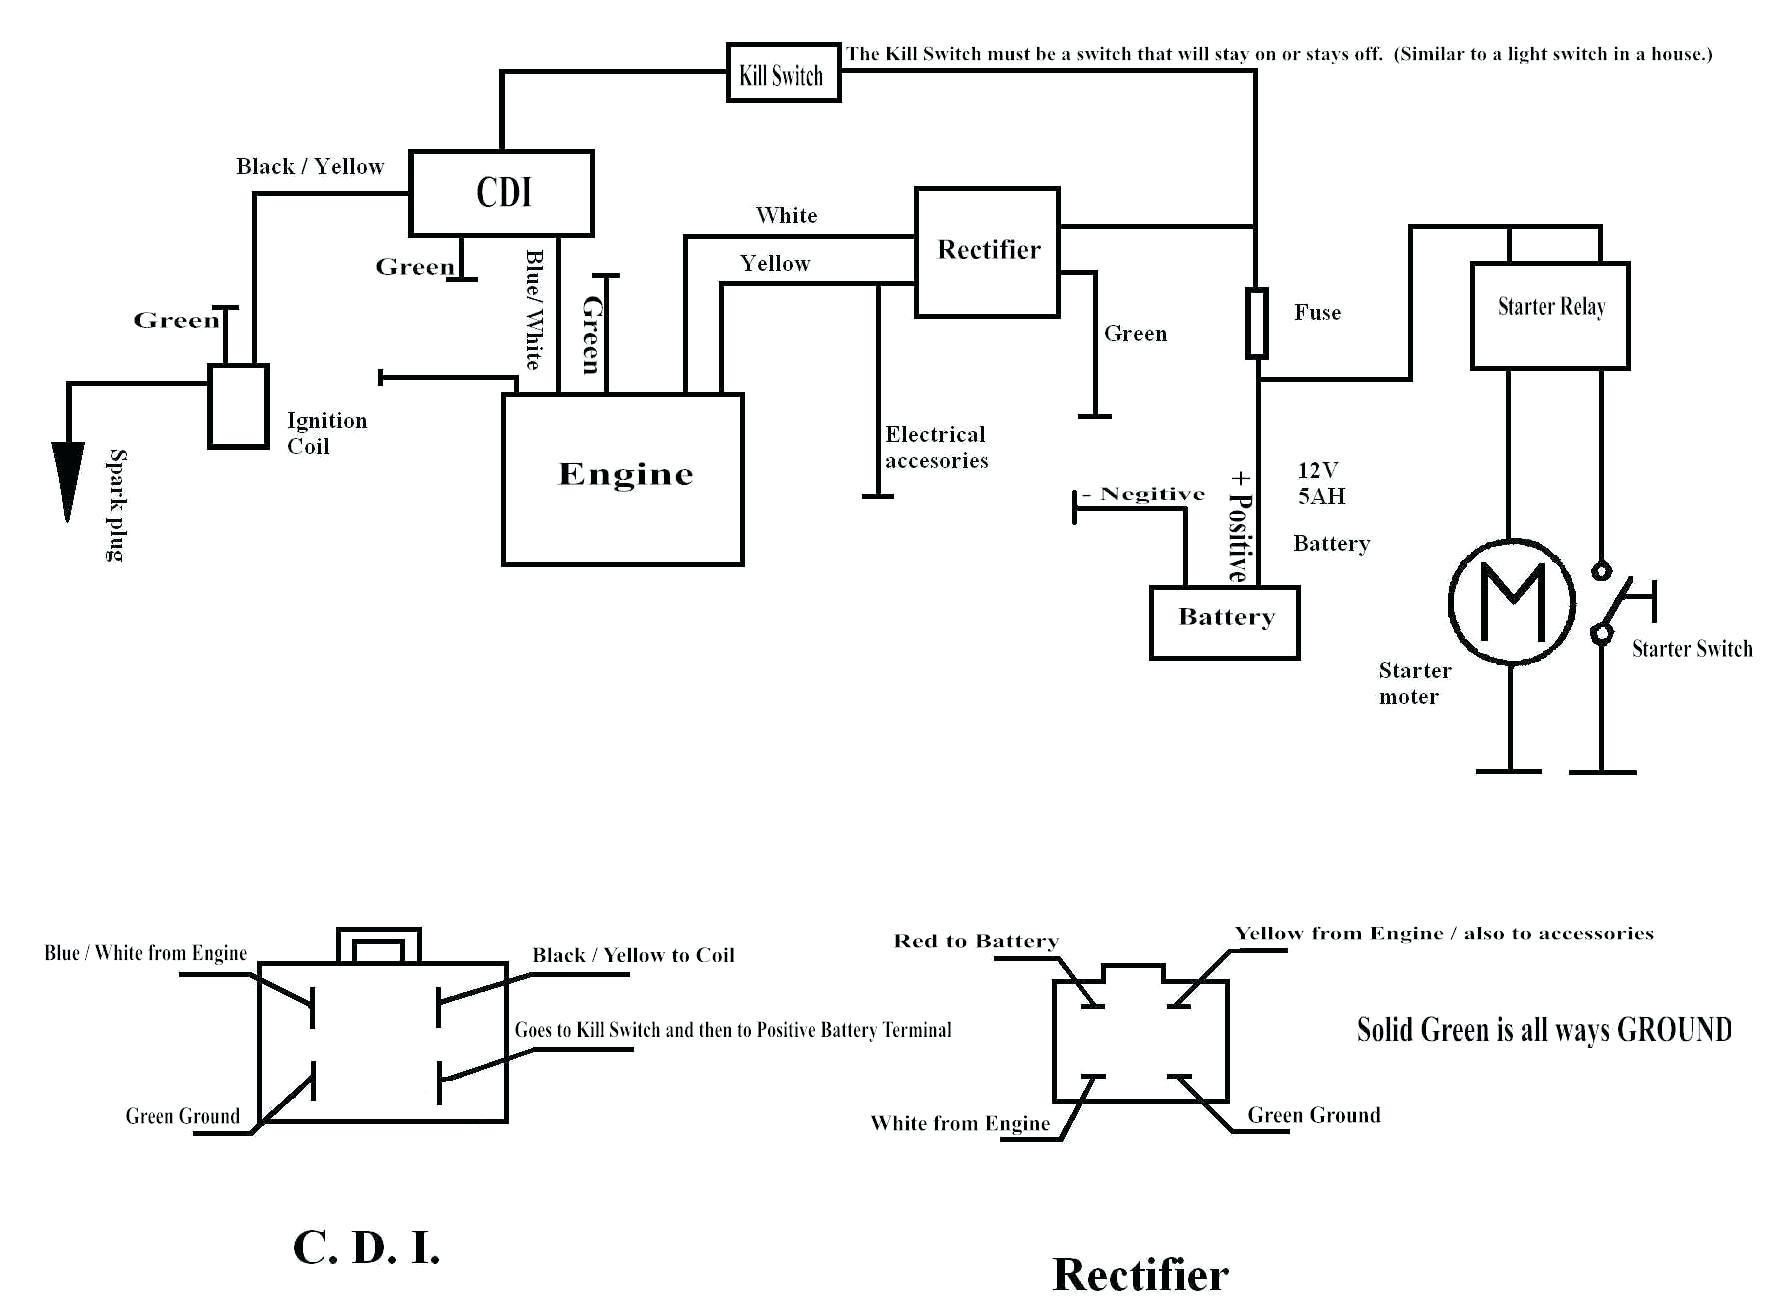 X1 Pocket Bike Wiring Harness - Wiring Diagram Third Level on x7 pocket rocket bikes, razor mx400 wire diagram, x7 super pocket bike, apc mini chopper wiring diagram, x7 pocket bike dimensions, x7 pocket bike wheels, x7 pocket bike parts, 49cc parts diagram, x7 pocket bike frame, bike rear axle assembly diagram, vanguard engine wiring diagram, 110cc mini chopper wiring diagram, pocket bike engine diagram, chinese scooter wiring diagram,